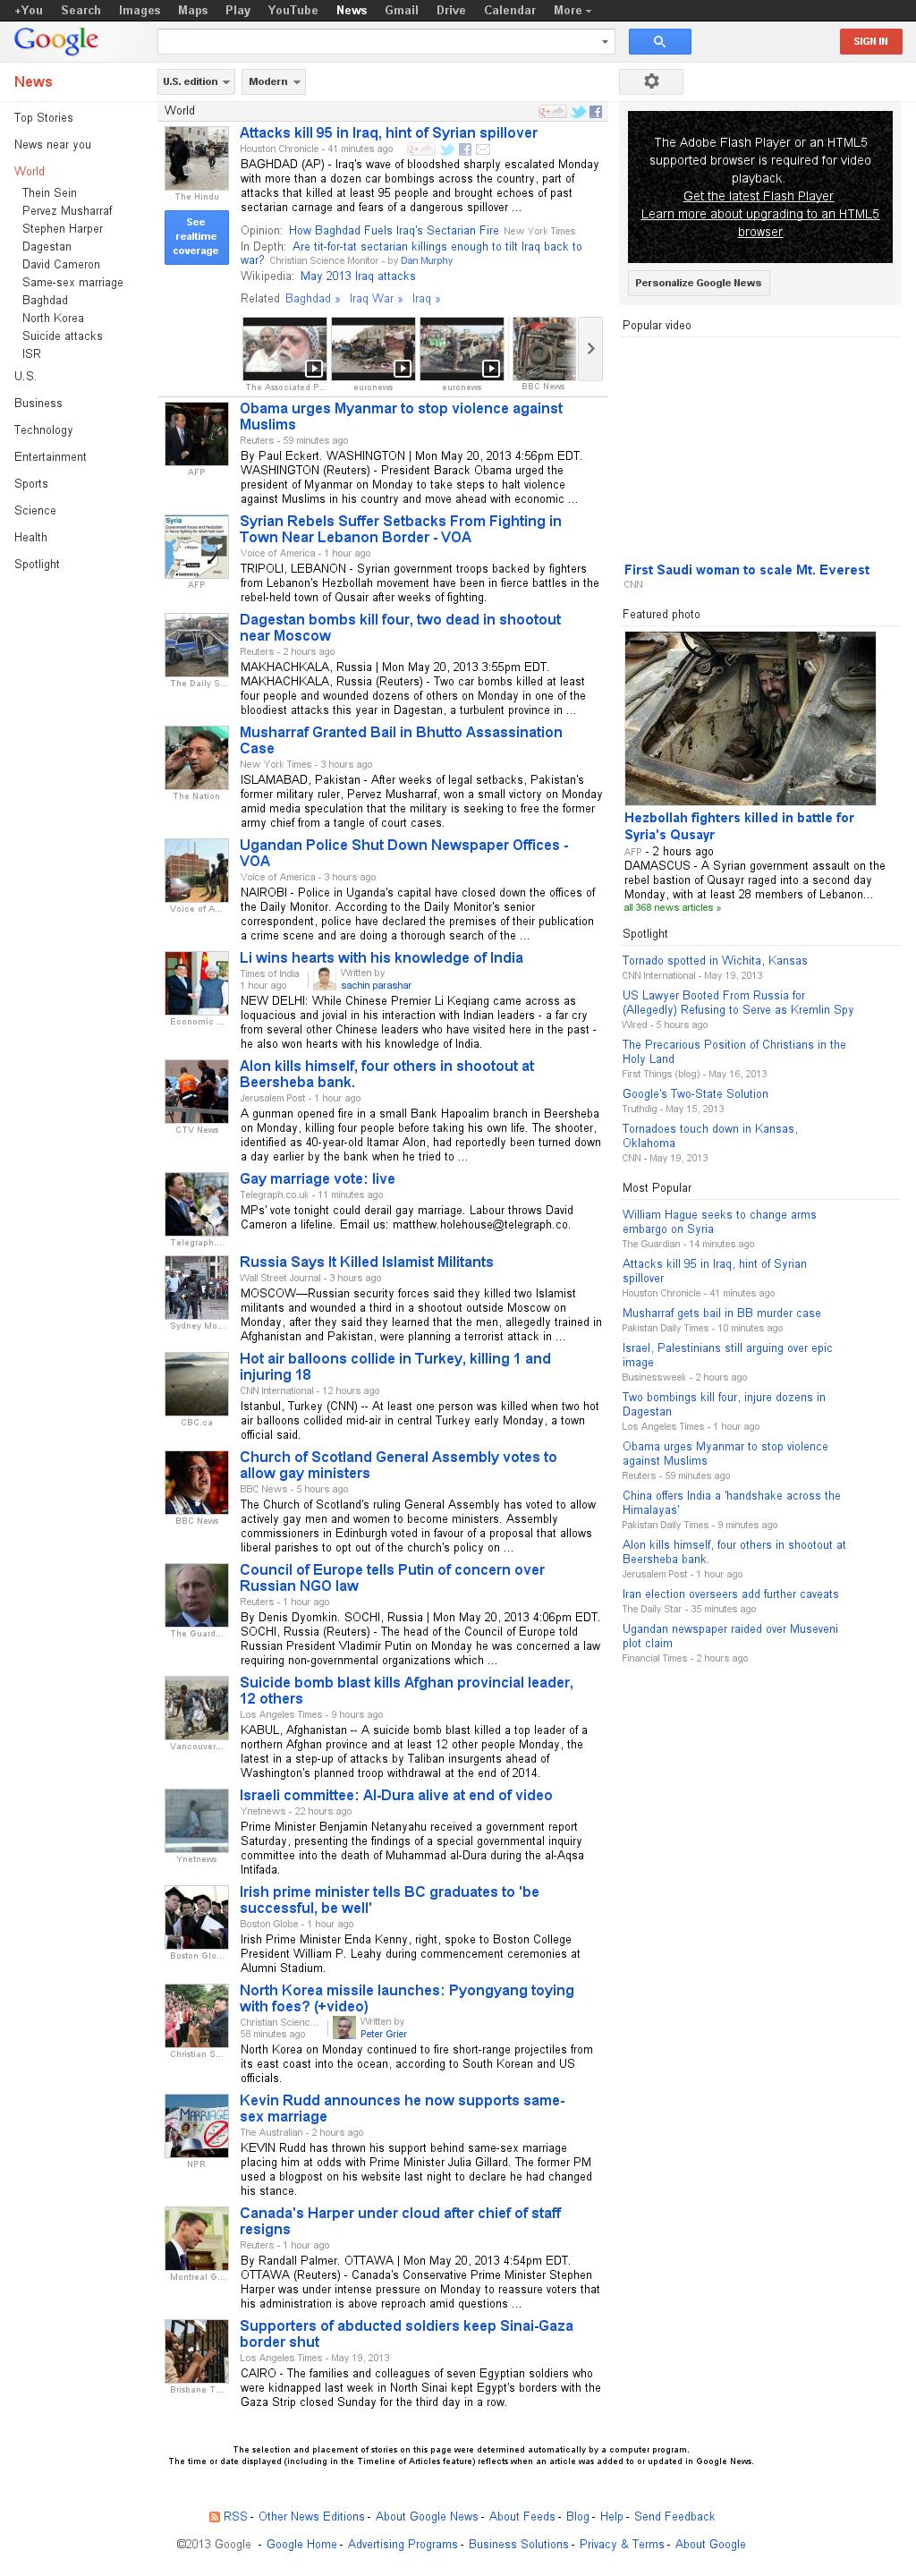 Google News: World at Monday May 20, 2013, 10:09 p.m. UTC